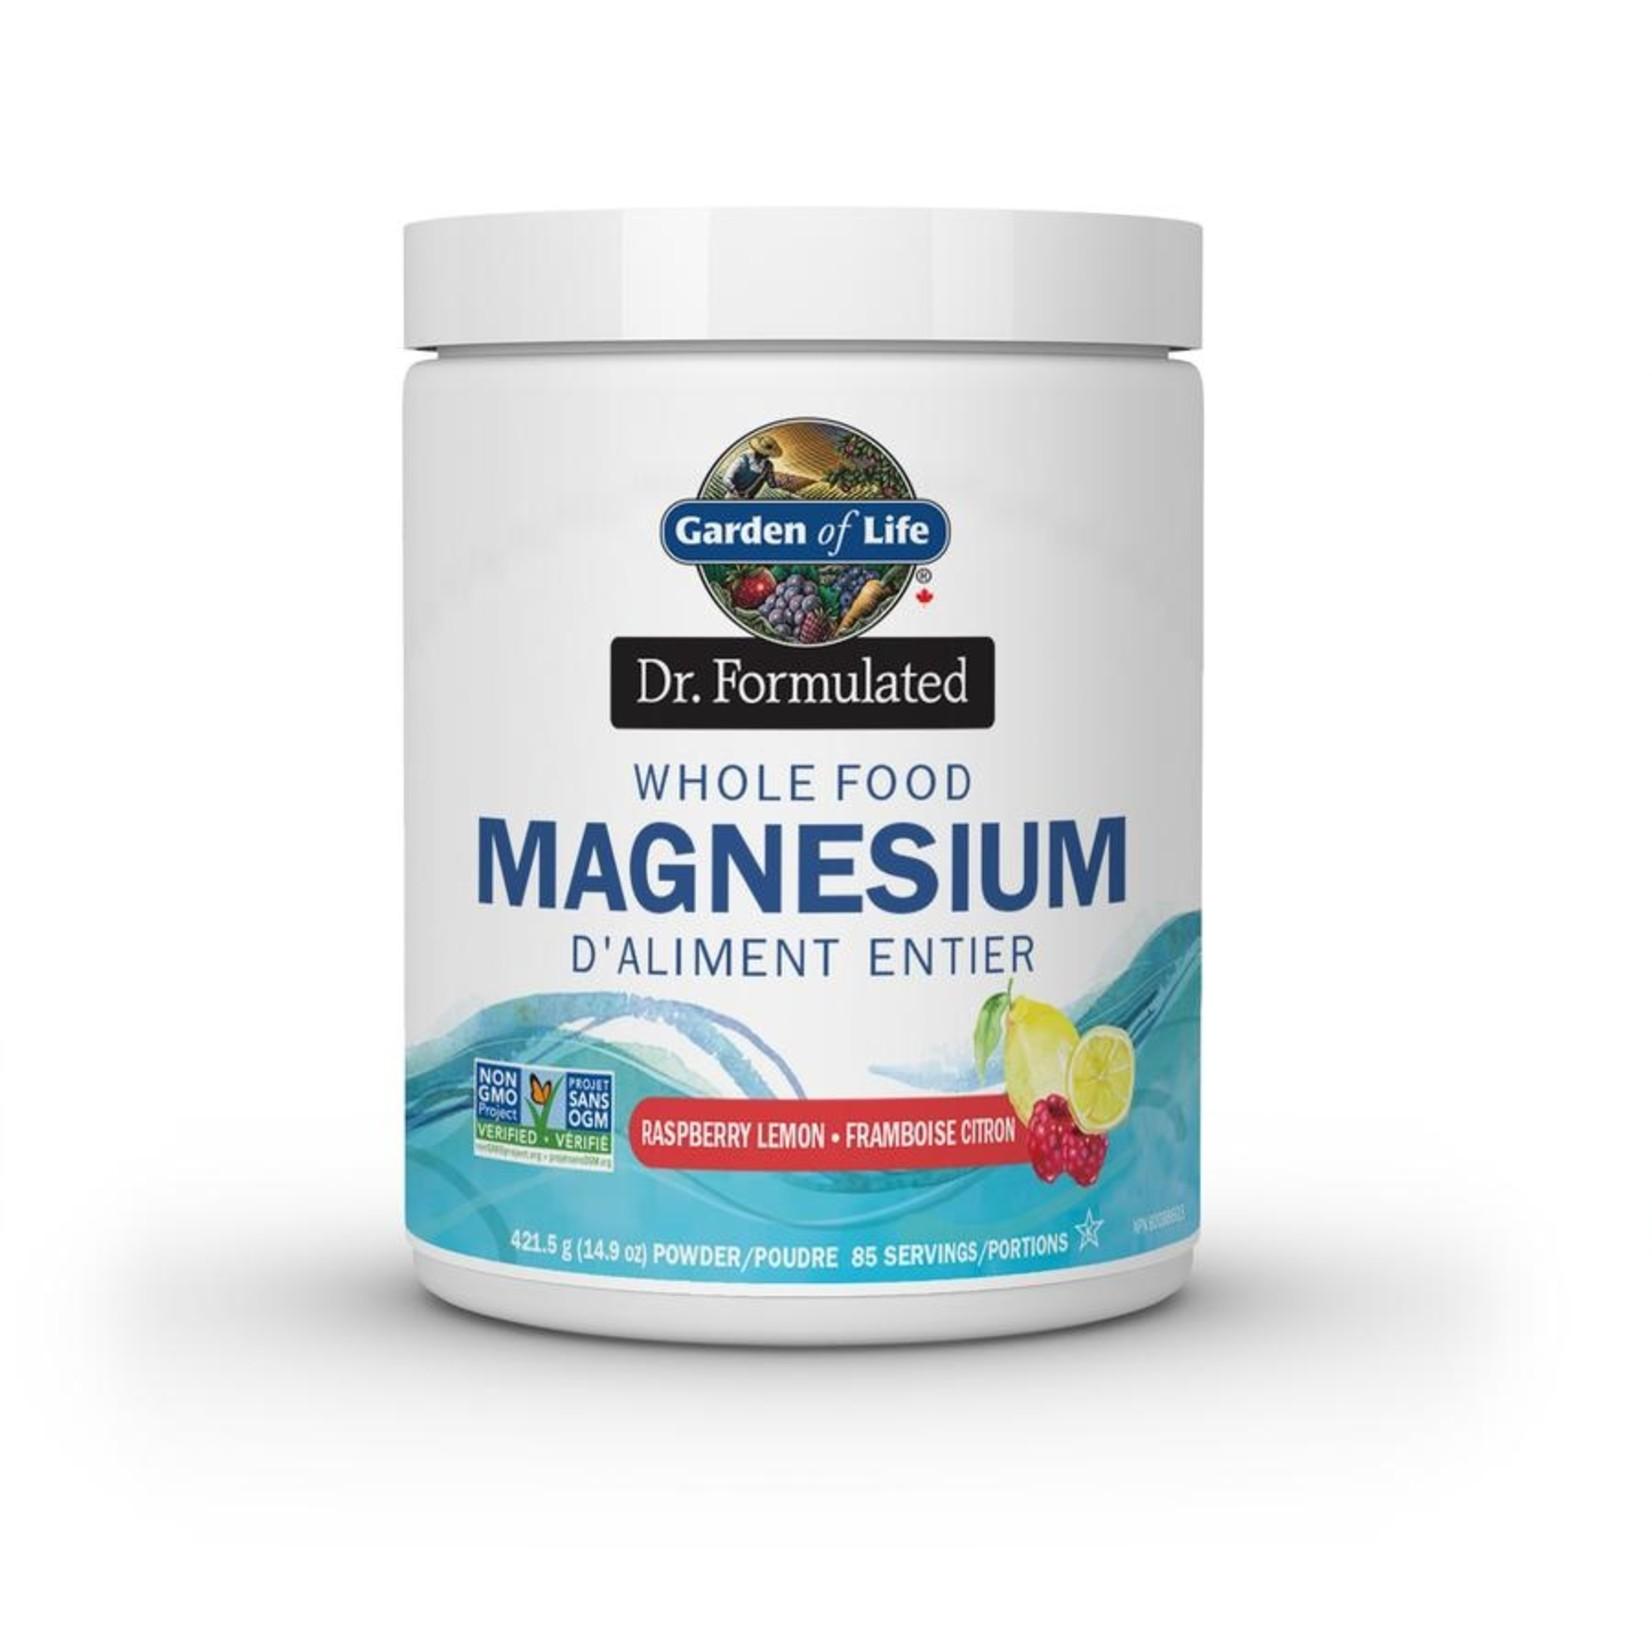 Garden Of Life Dr. Formulated Whole Food Magnesium Raspberry Lemon 421g